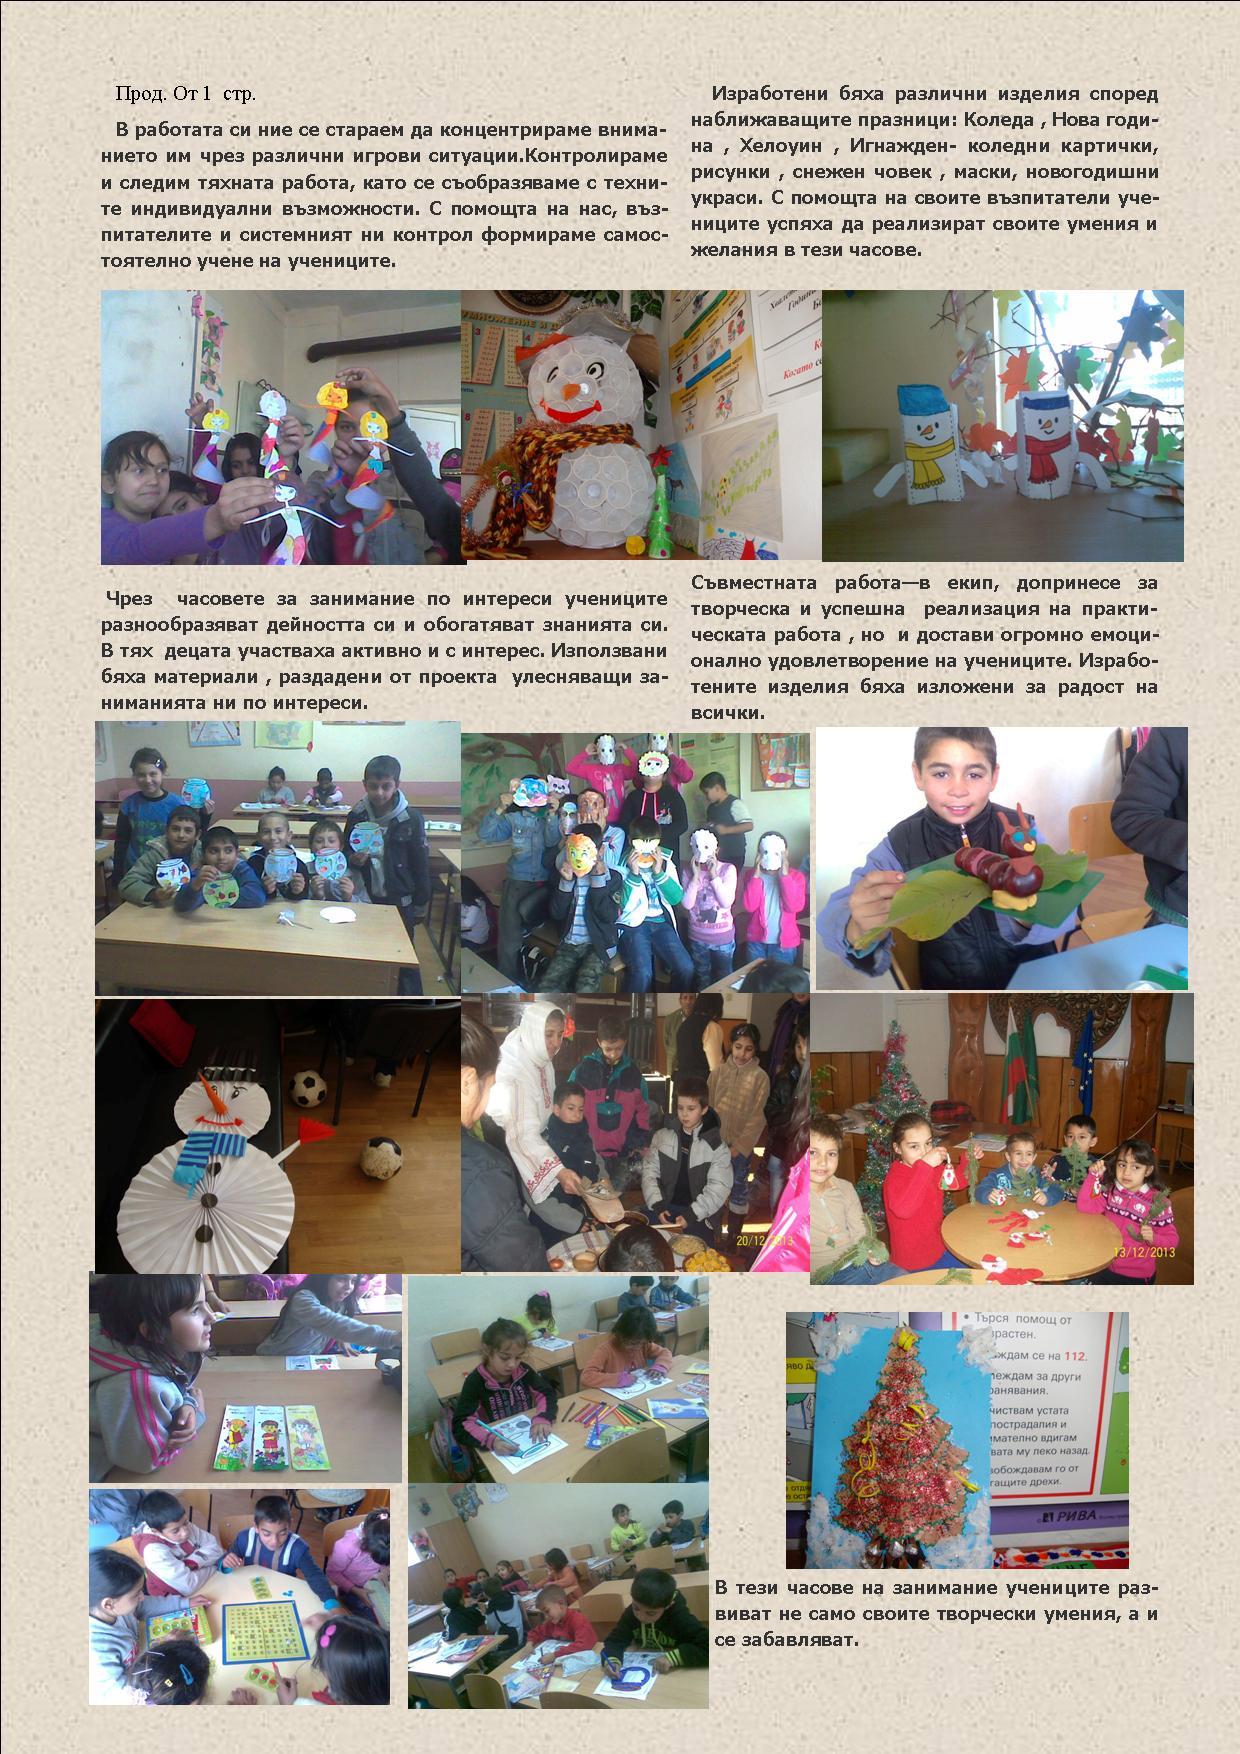 1вестник-12-ти бр-декември-стр2 за 2013